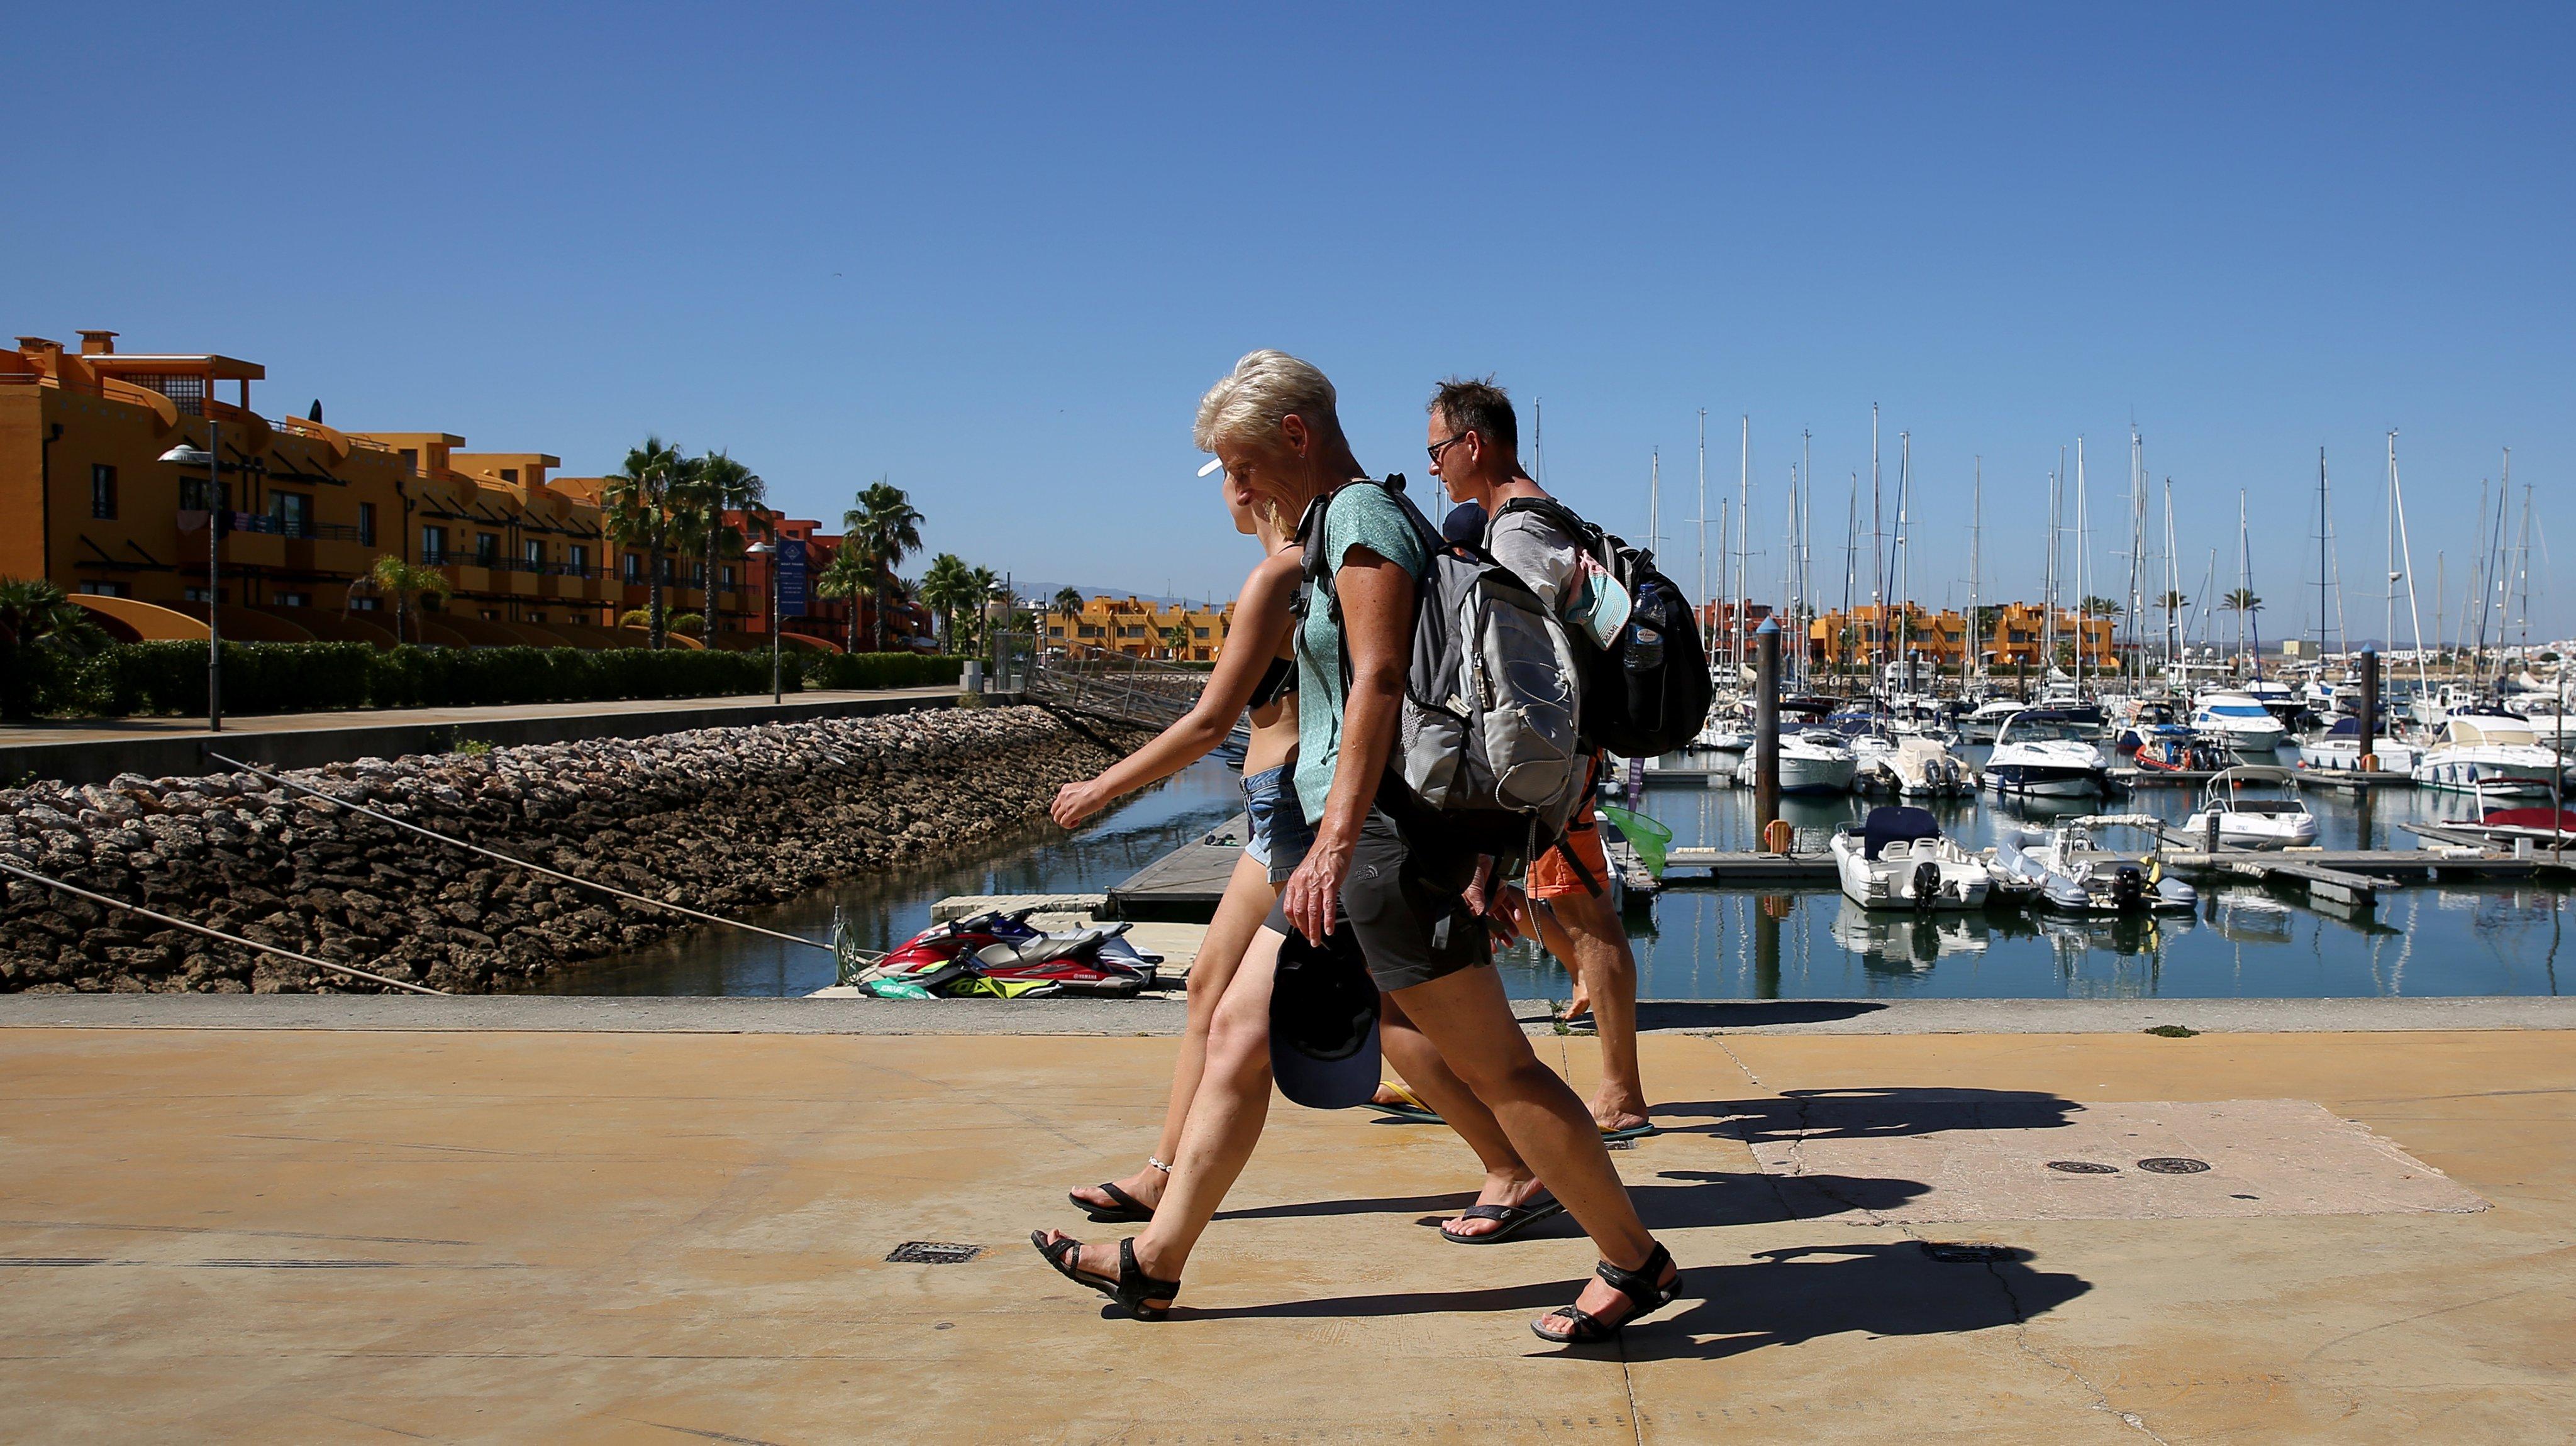 Portugal: Tourism during Covid-19 in Algarve region